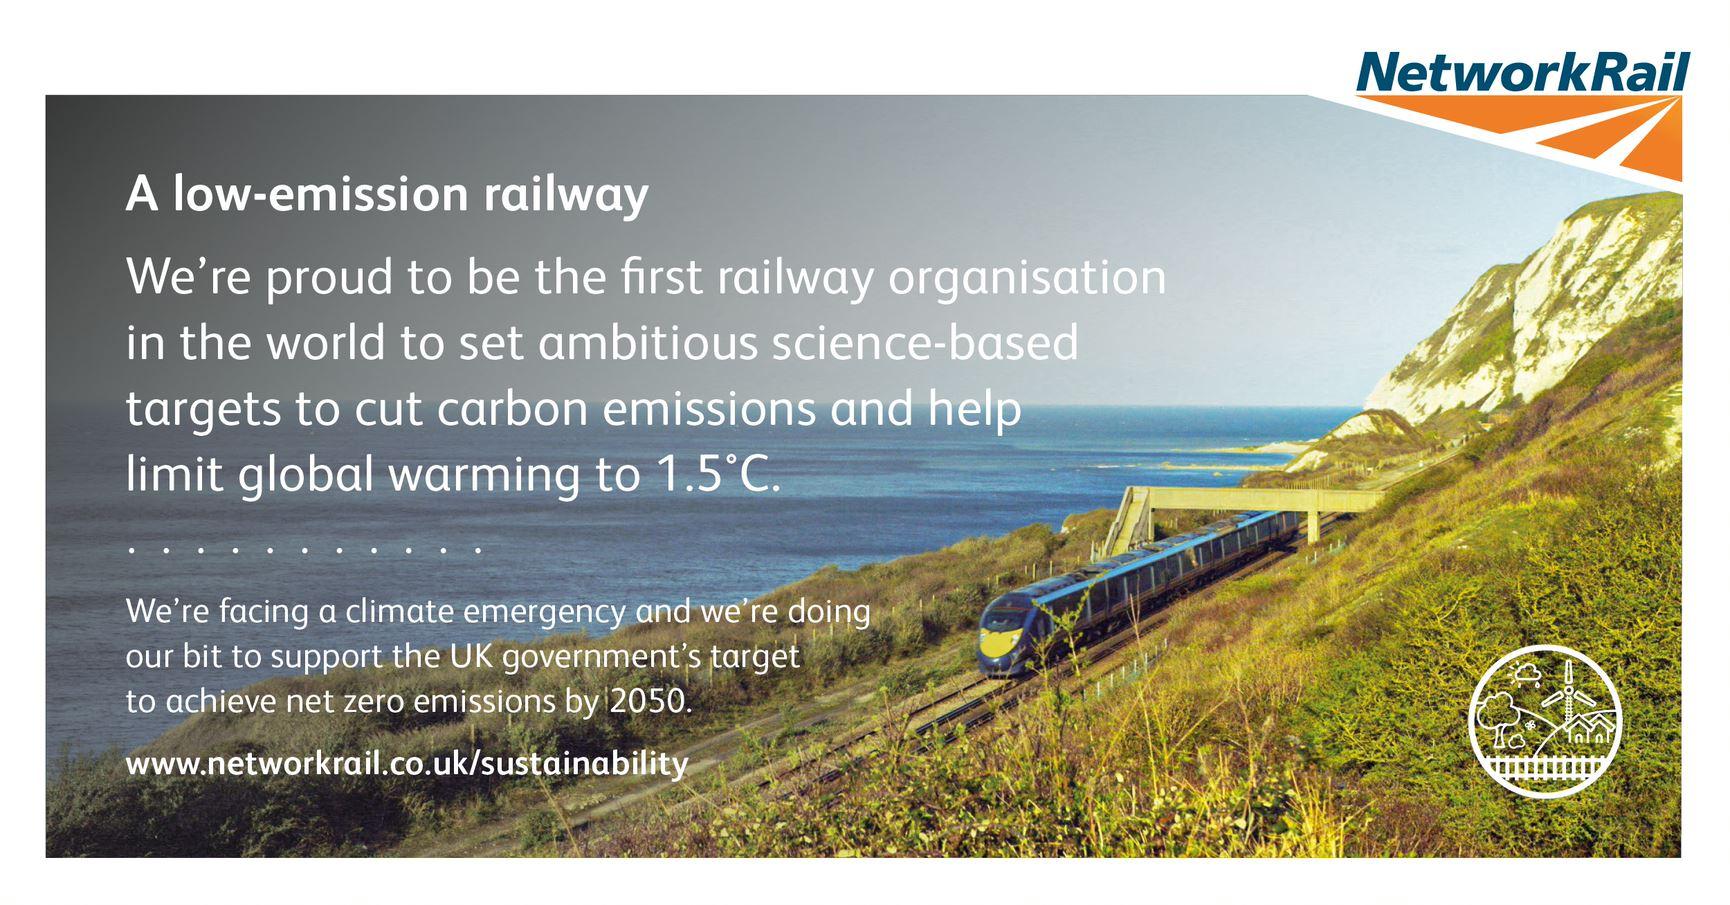 Network Rail science-based targets